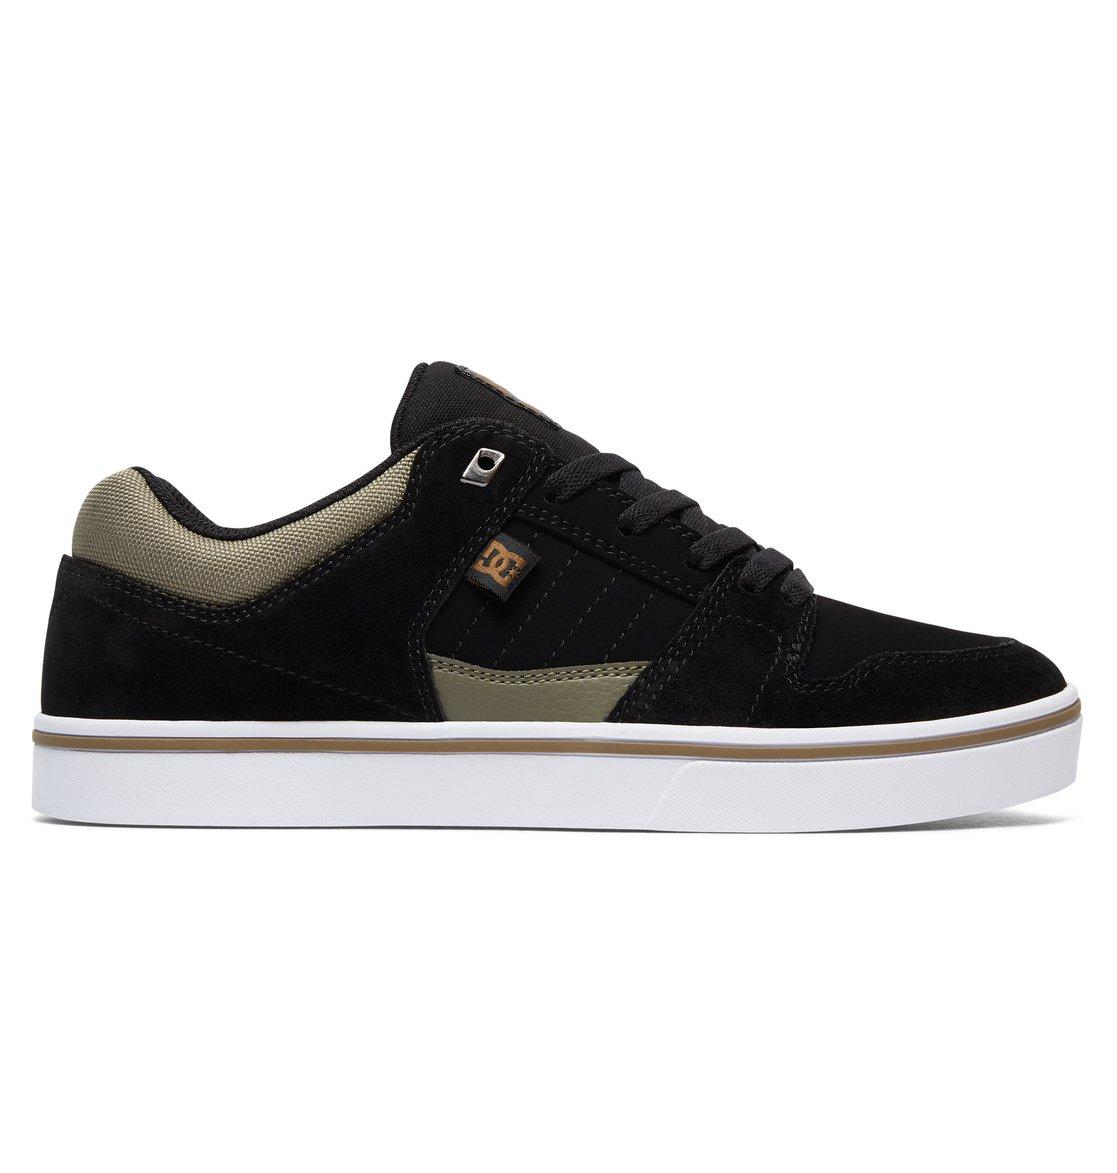 DC DC Shoes ADYS100224 ADYS100224 Course Course Shoes Course ADYS100224 ADYS100224 Shoes Shoes Shoes Course DC Shoes Shoes dfBSqd